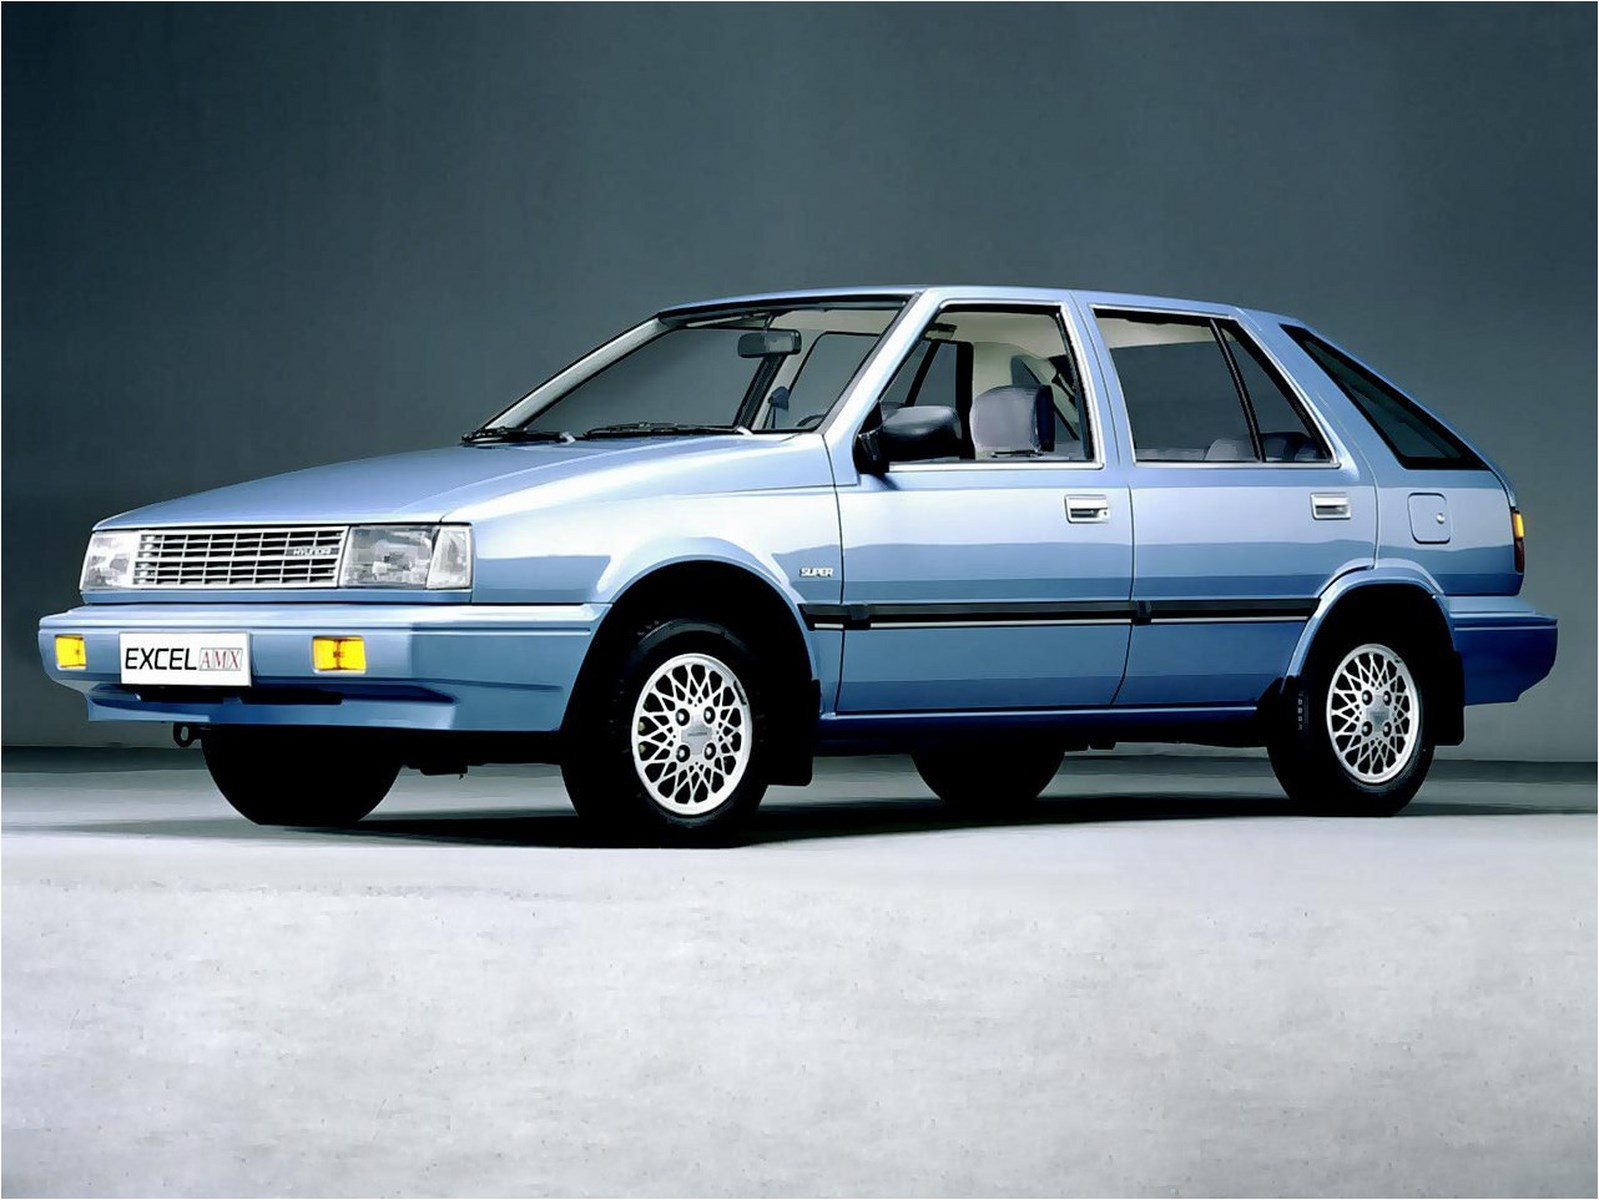 Hyundai Excel & Accent 1986 thru 1998 Automotive Books ...